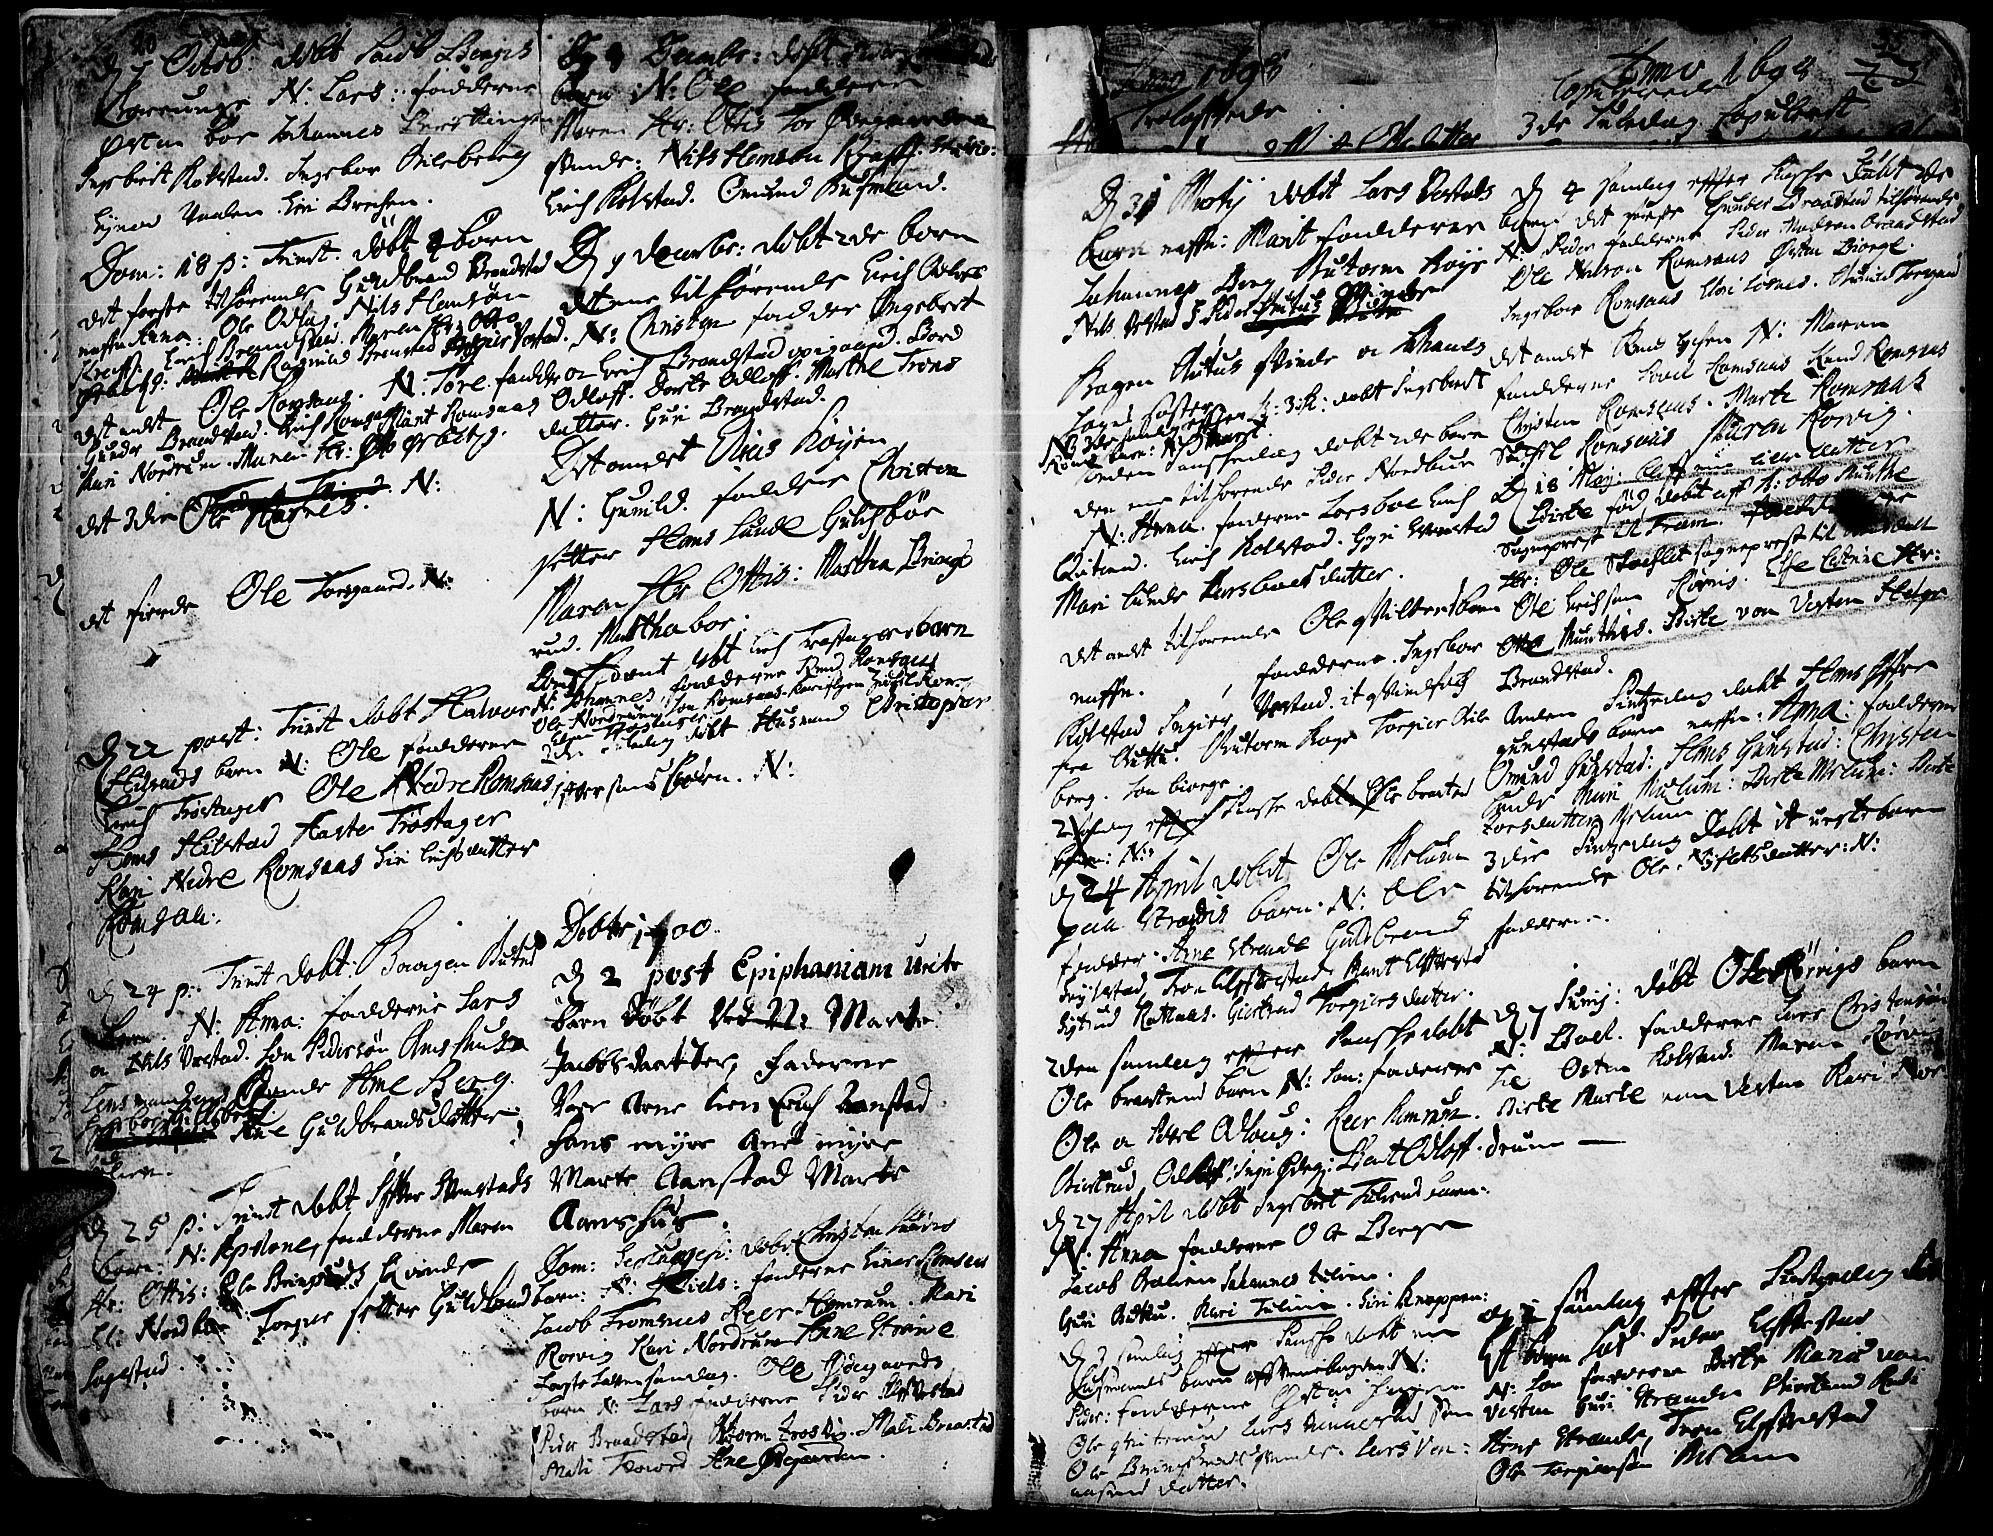 SAH, Ringebu prestekontor, Ministerialbok nr. 1, 1696-1733, s. 20-21